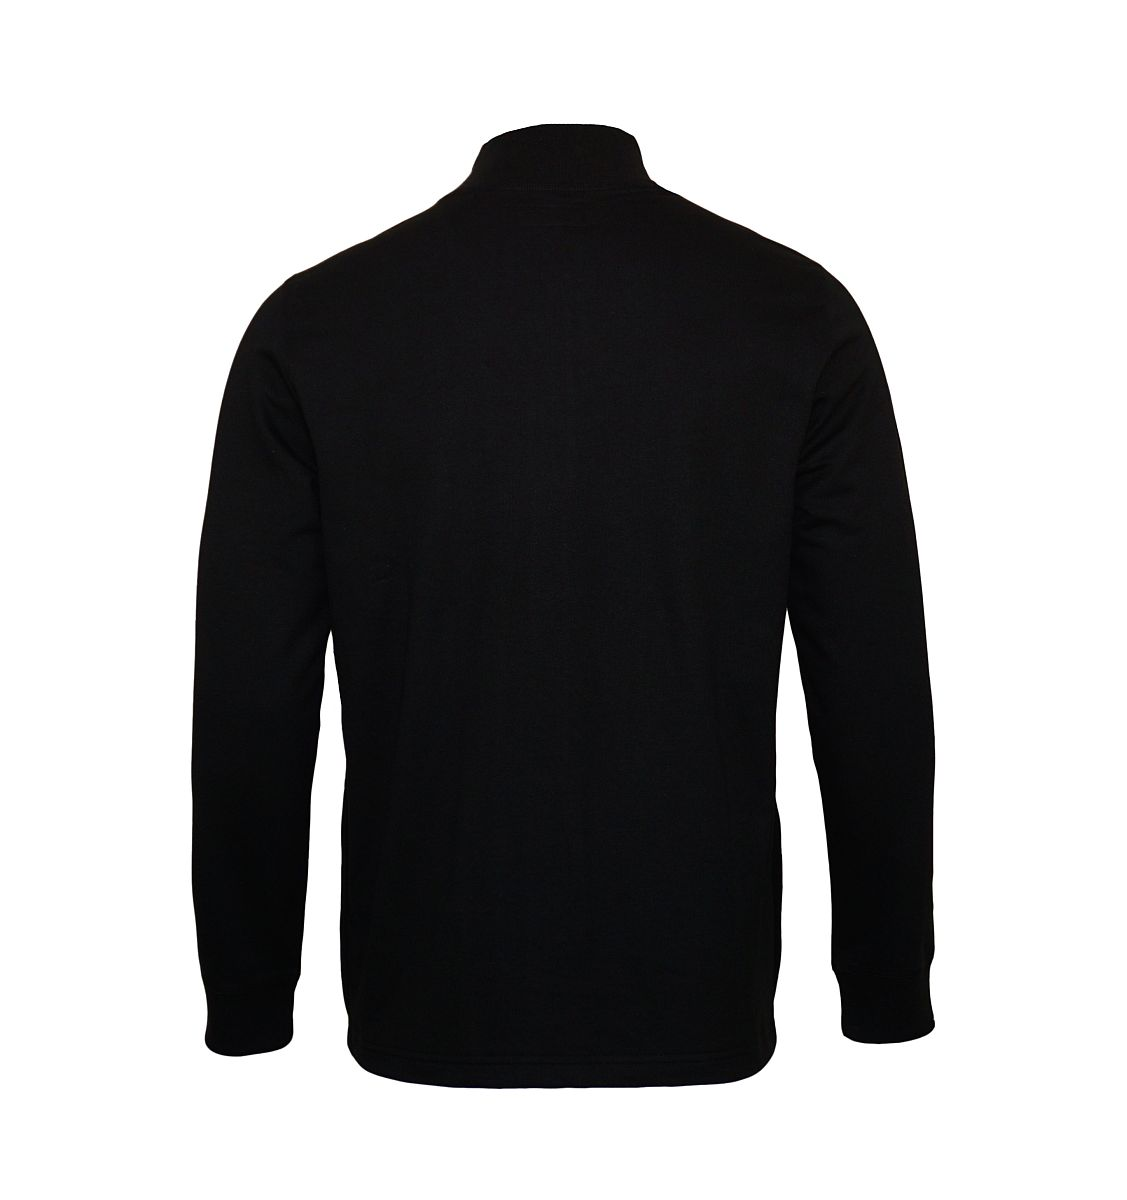 Ralph Lauren Sweatjacke Strickjacke Spring1UDW POLO BLACK W18-RL1